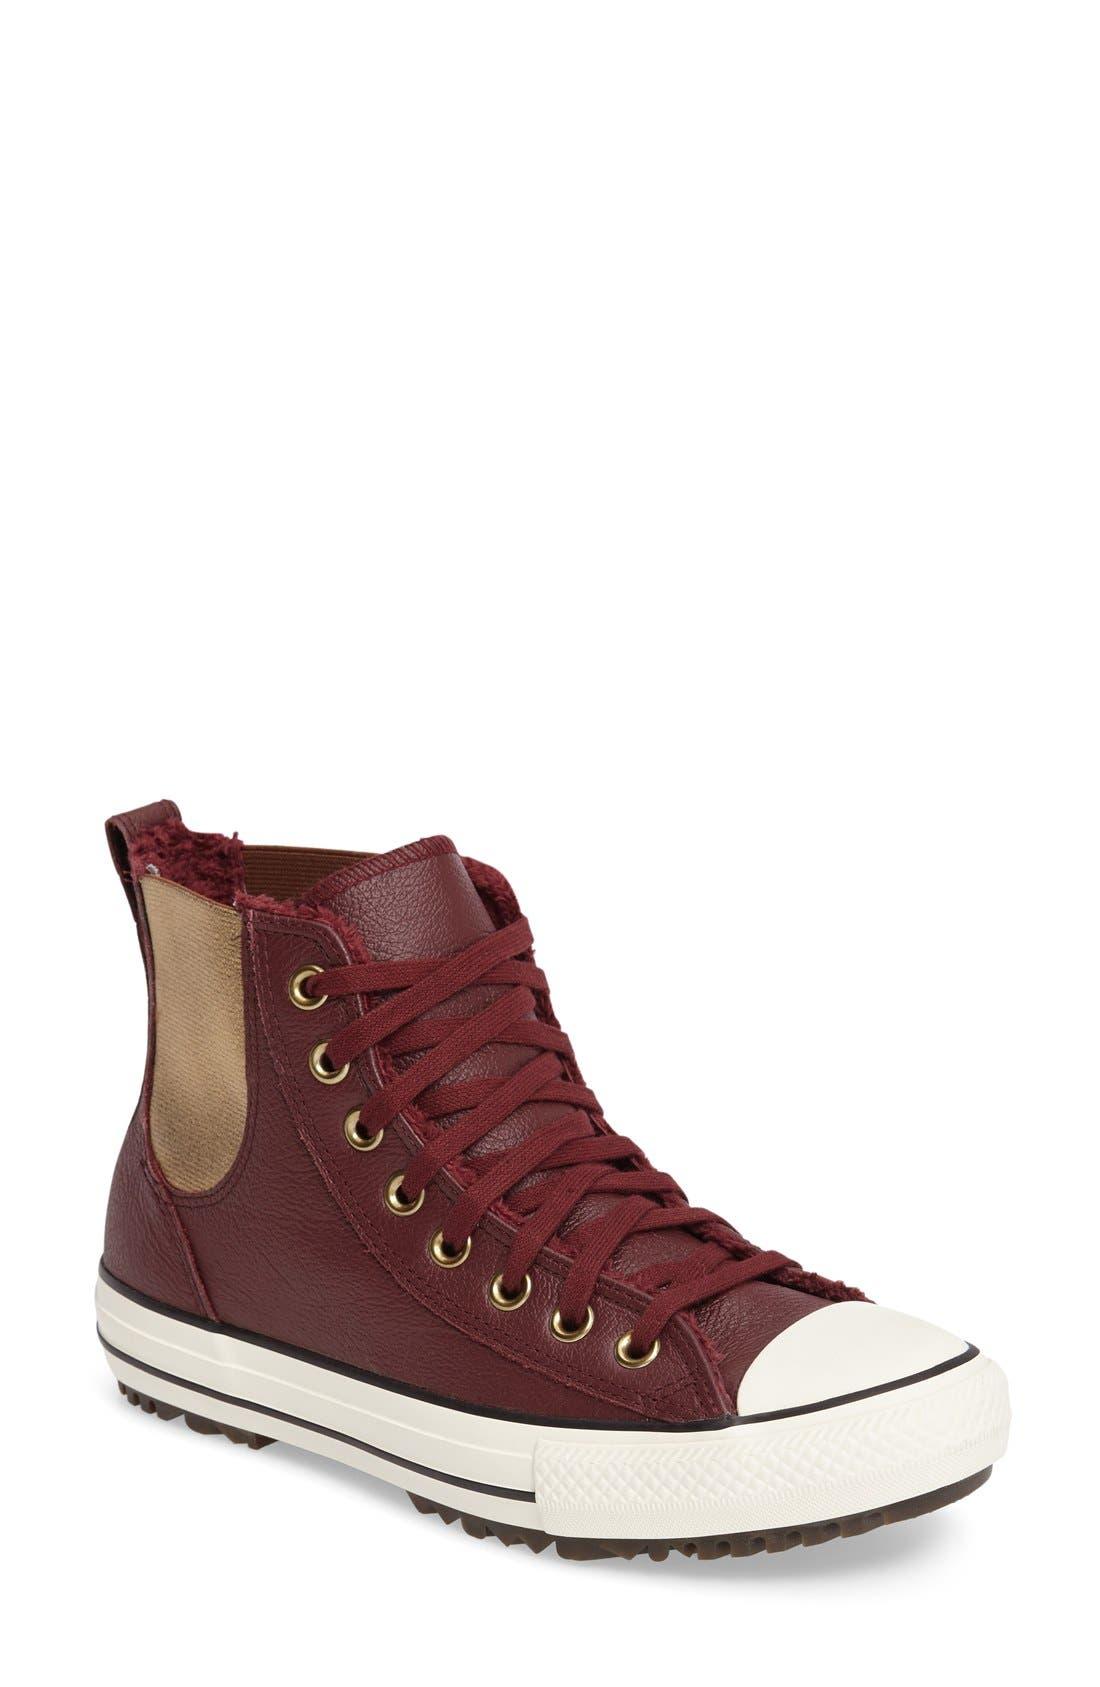 Main Image - Converse Chuck Taylor® All Star® Faux Fur Chelsea Sneaker (Women)